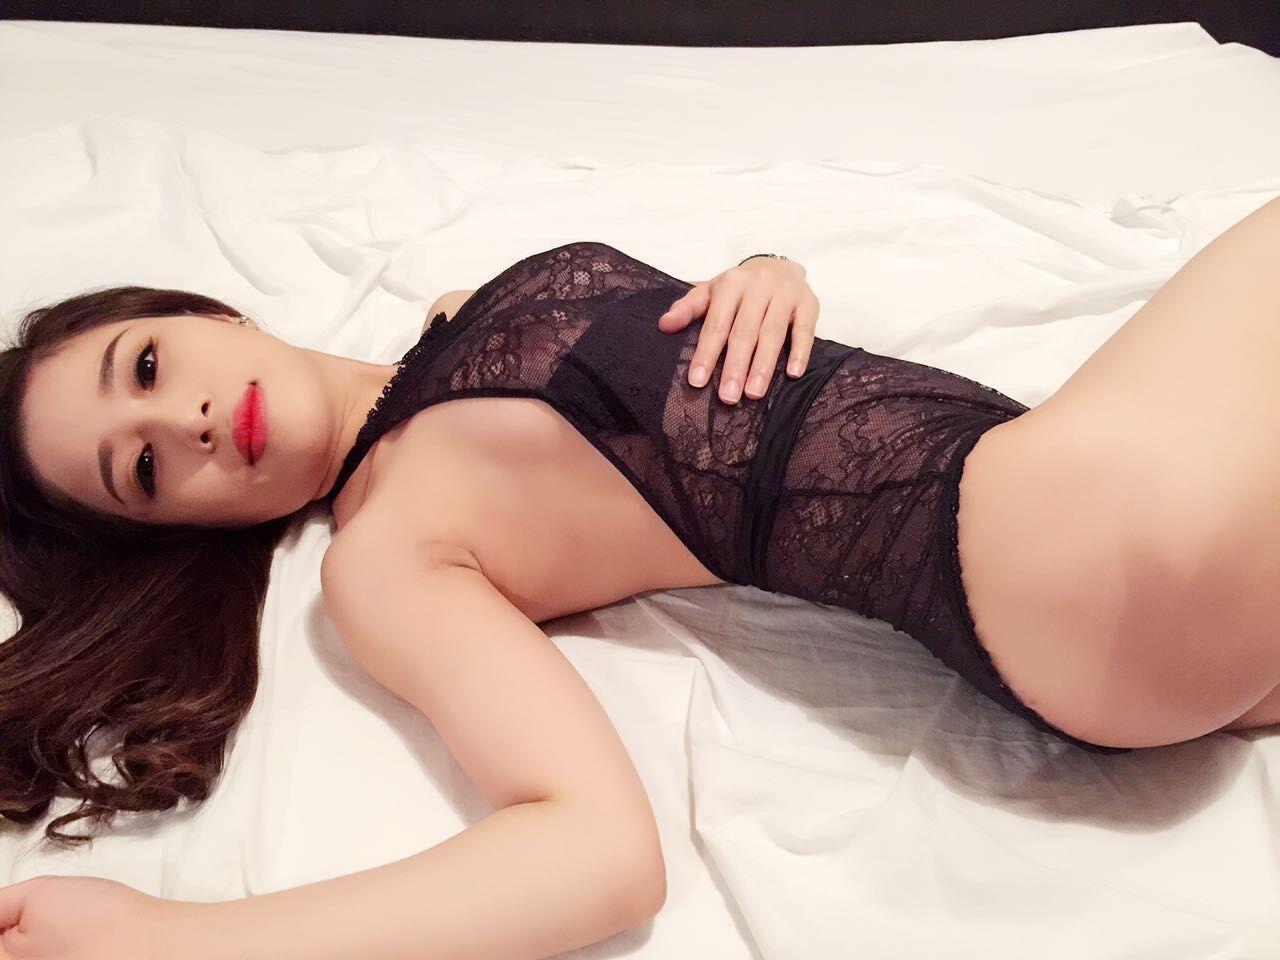 porno vietnam escort a agen